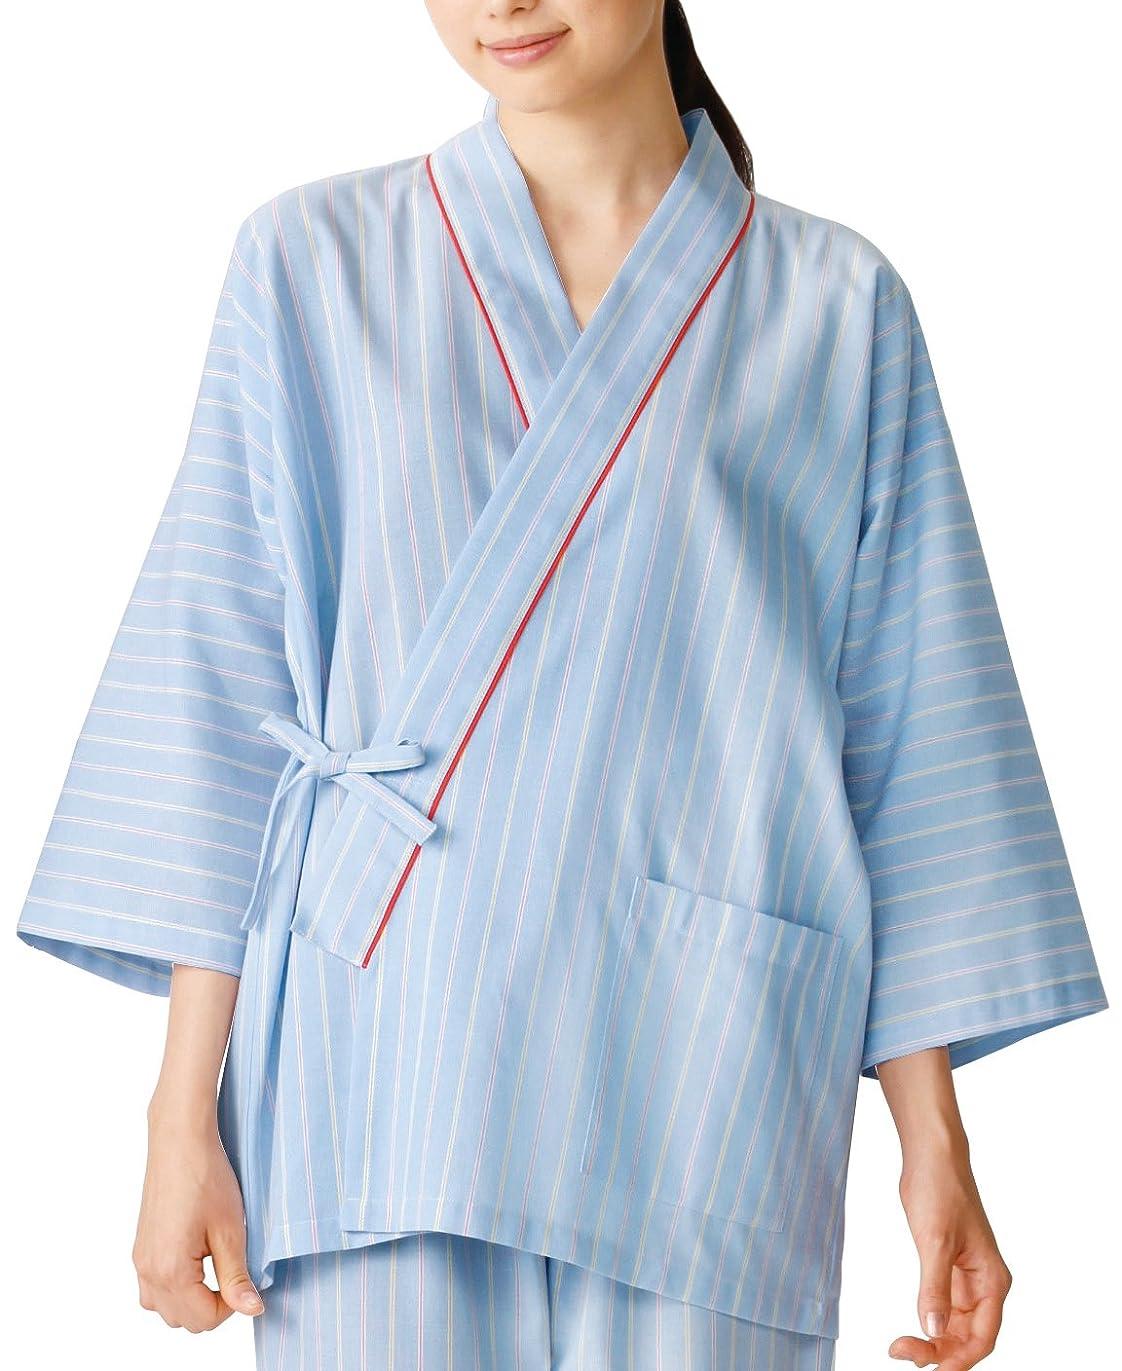 推進力ブラケット近傍医療/介護施設用  患者衣上衣(甚平型) KAZEN  サイズ:3L 285-98